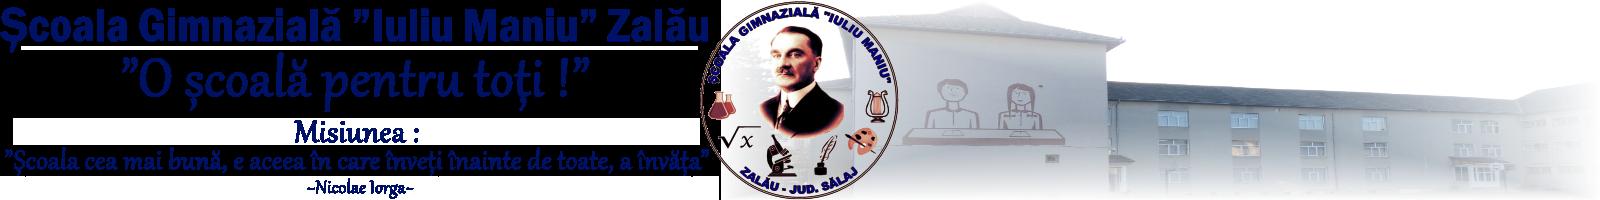 "Scoala GImnaziala ""Iuliu Maniu"" Zalau"